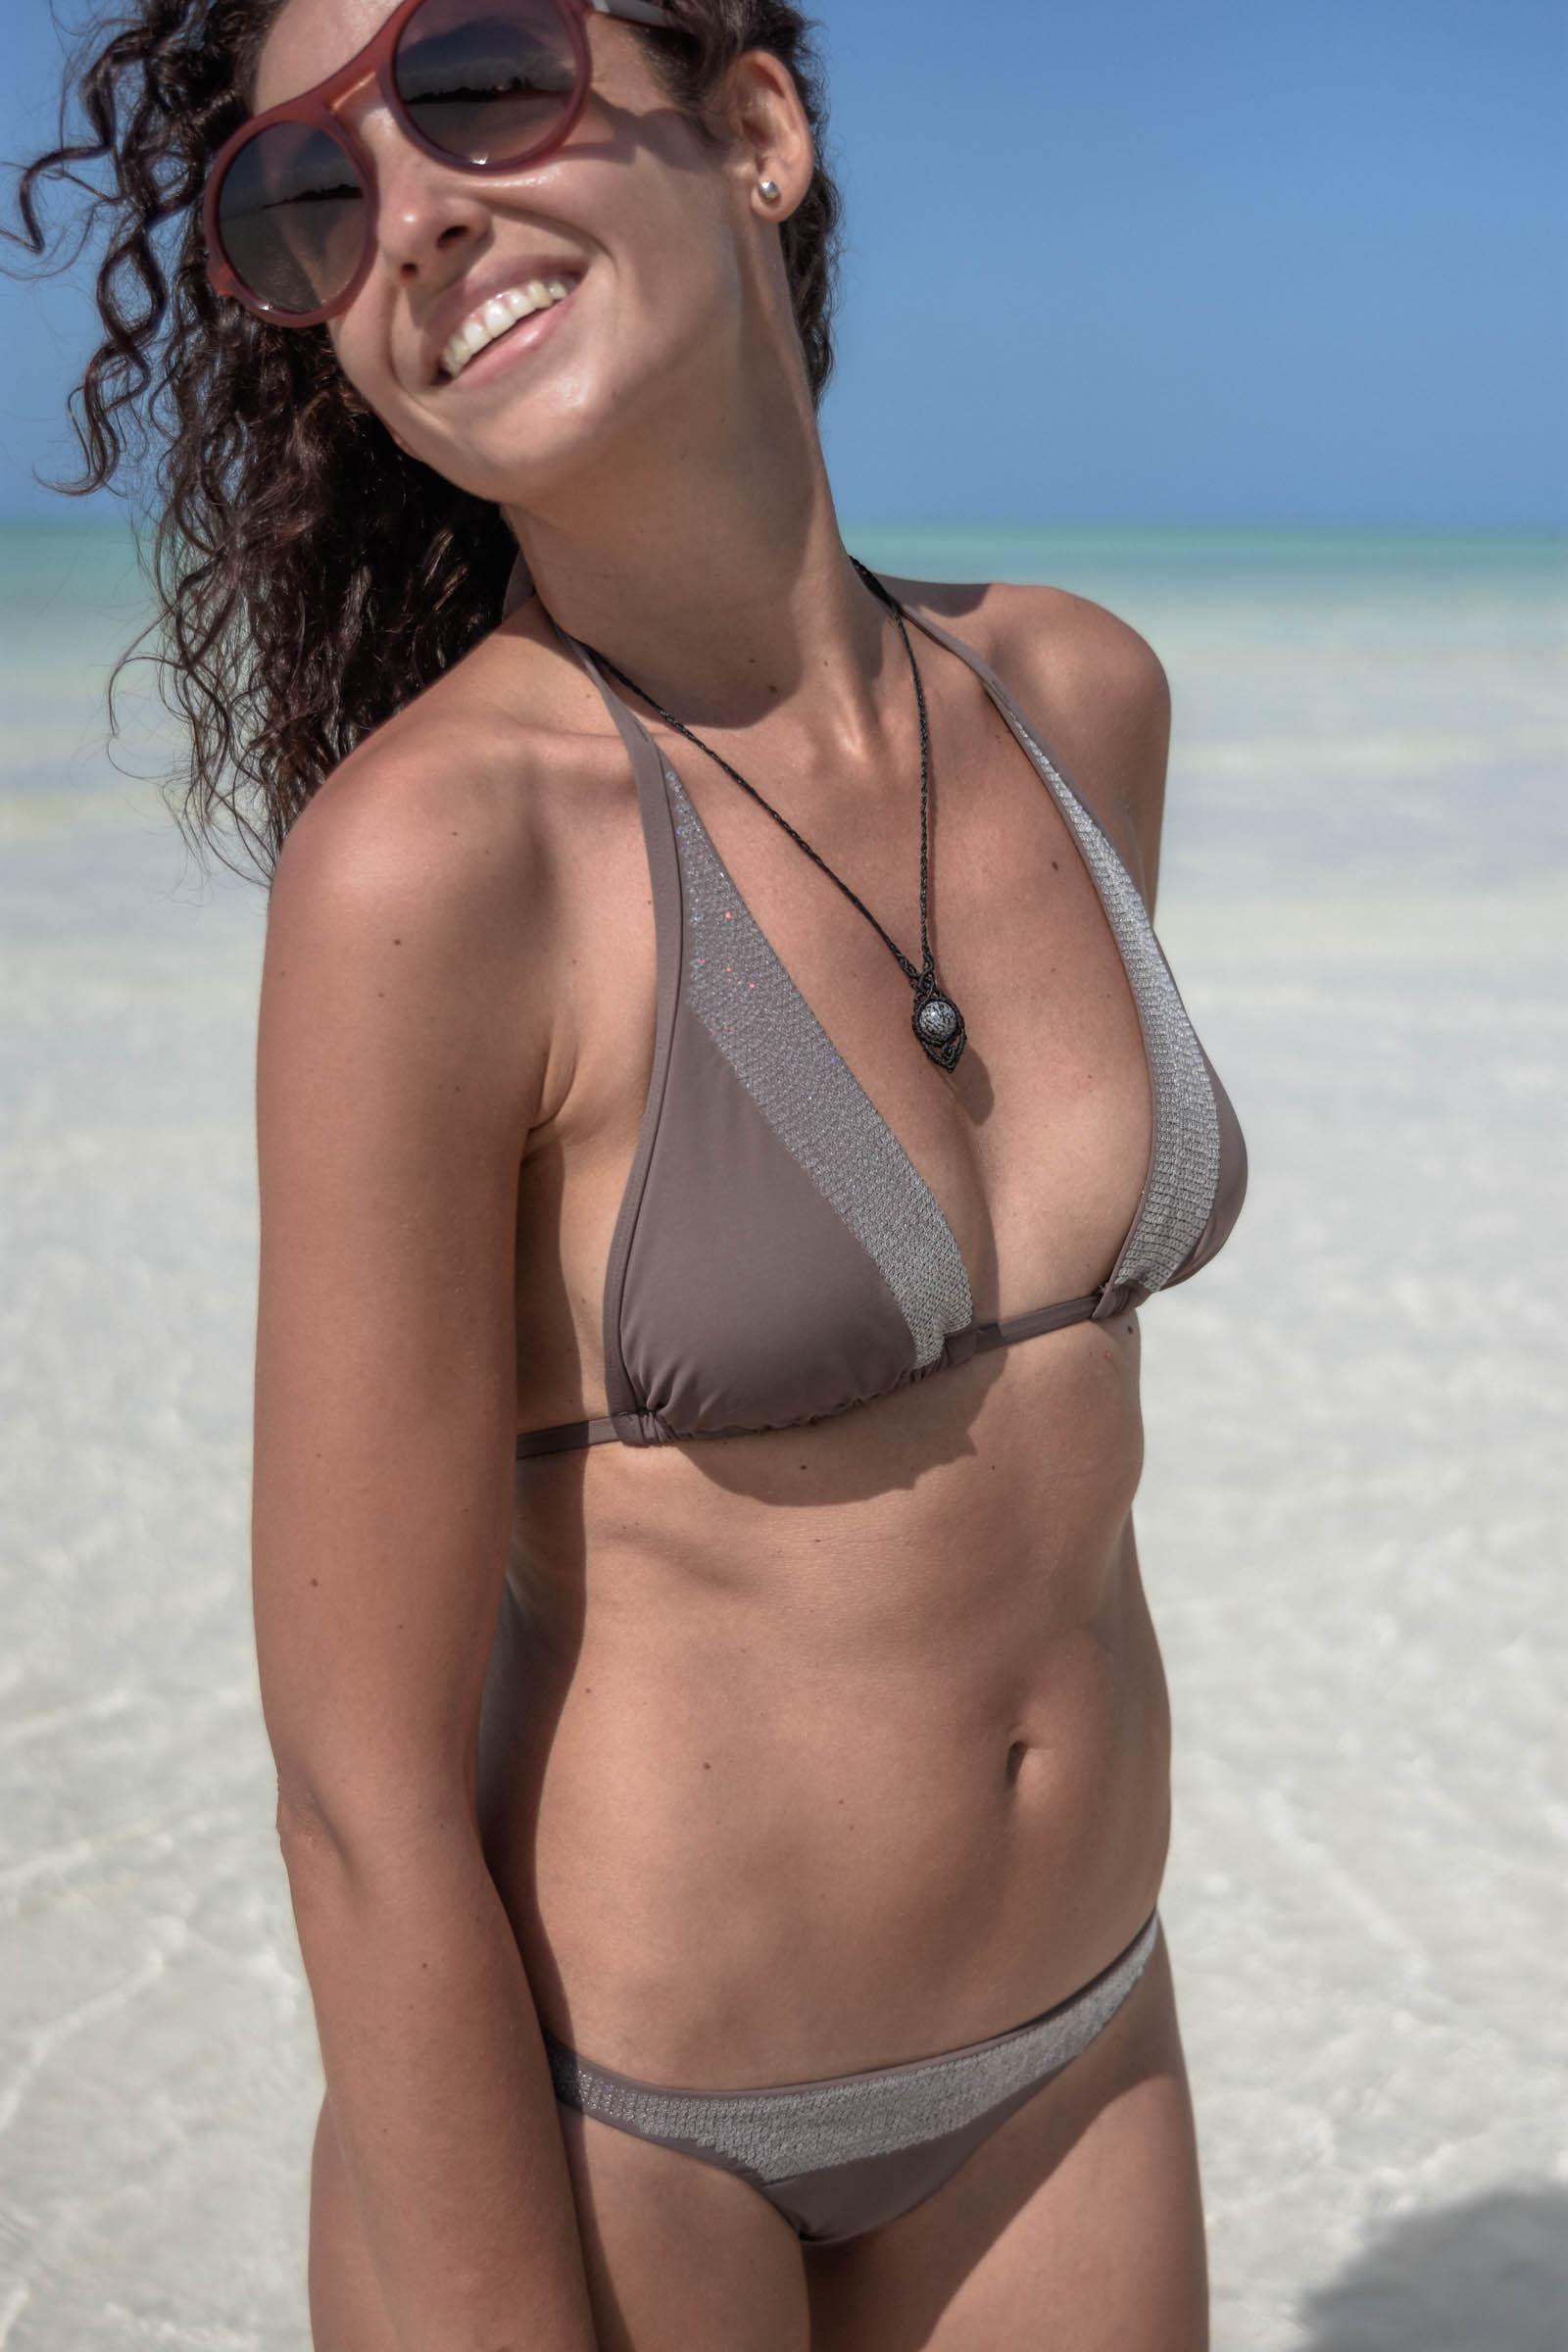 el-blog-de-silvia-rodriguez-lifestyle-travel-blogger-verano-vacaciones-en-holbox-mexico-caribe-holidays-playa-beach-bikini_Calvin_klein